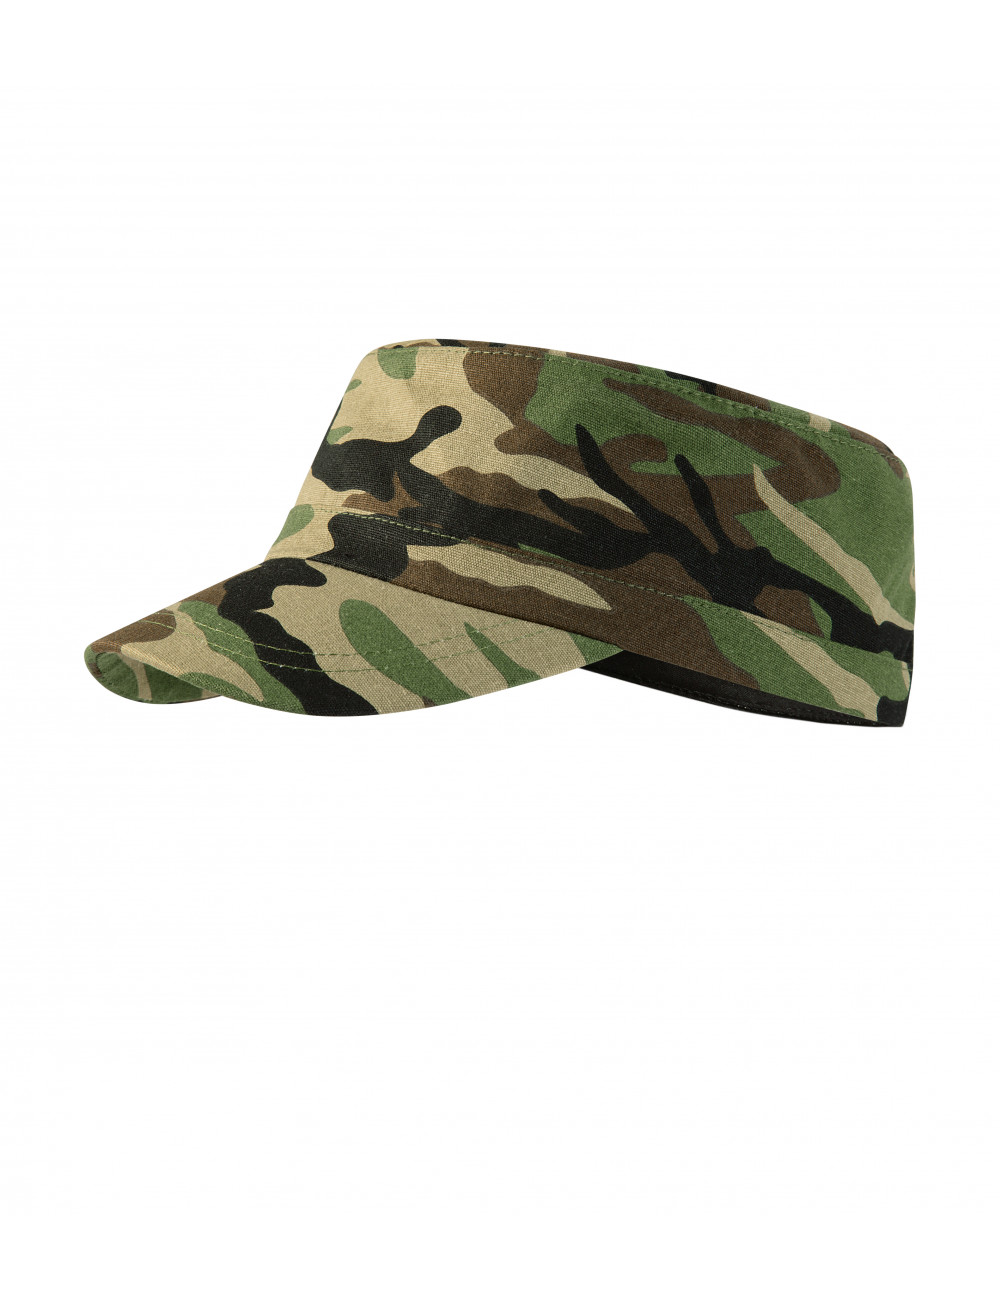 Adler MALFINI Czapka unisex Camo Latino C24 camouflage brown